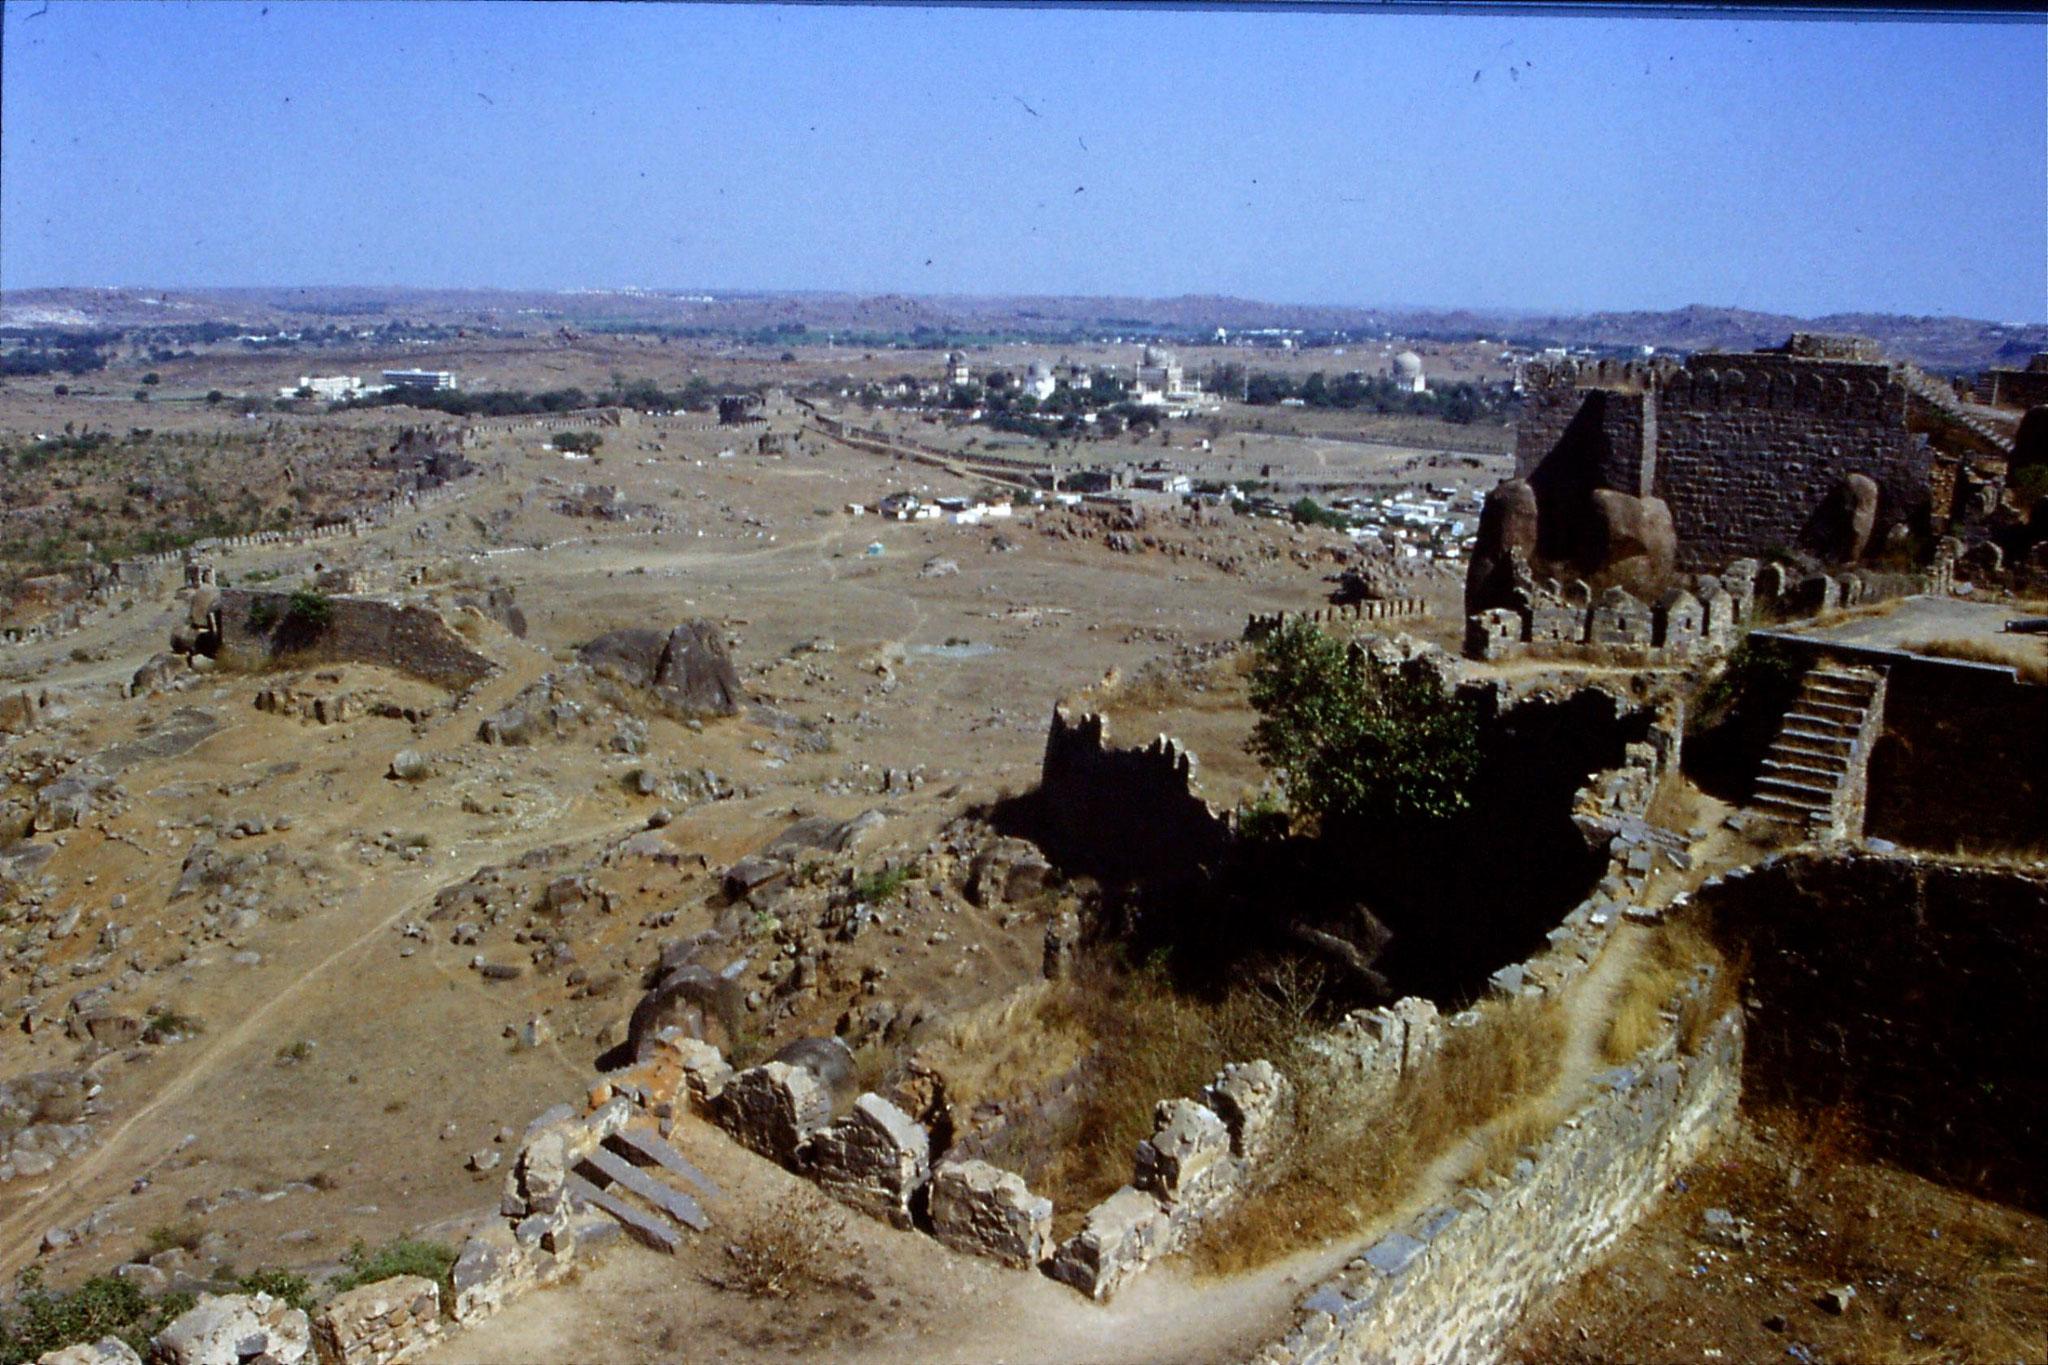 108/29: 22/3/1990 Hyderabad - Qutab Shahi tombs from Golconda Fort